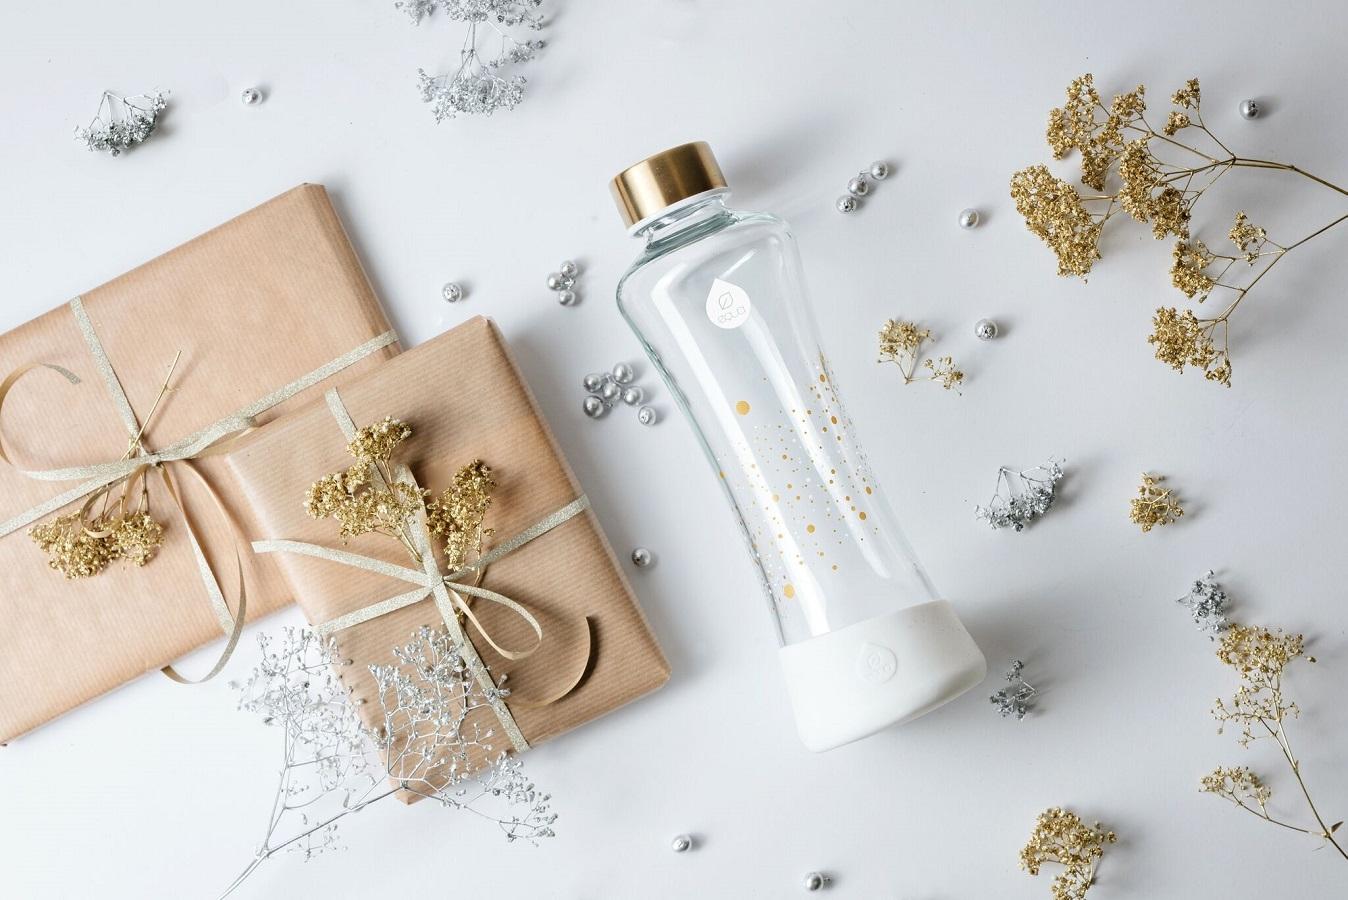 Sticla pentru apa Equa Infinity -550 ml